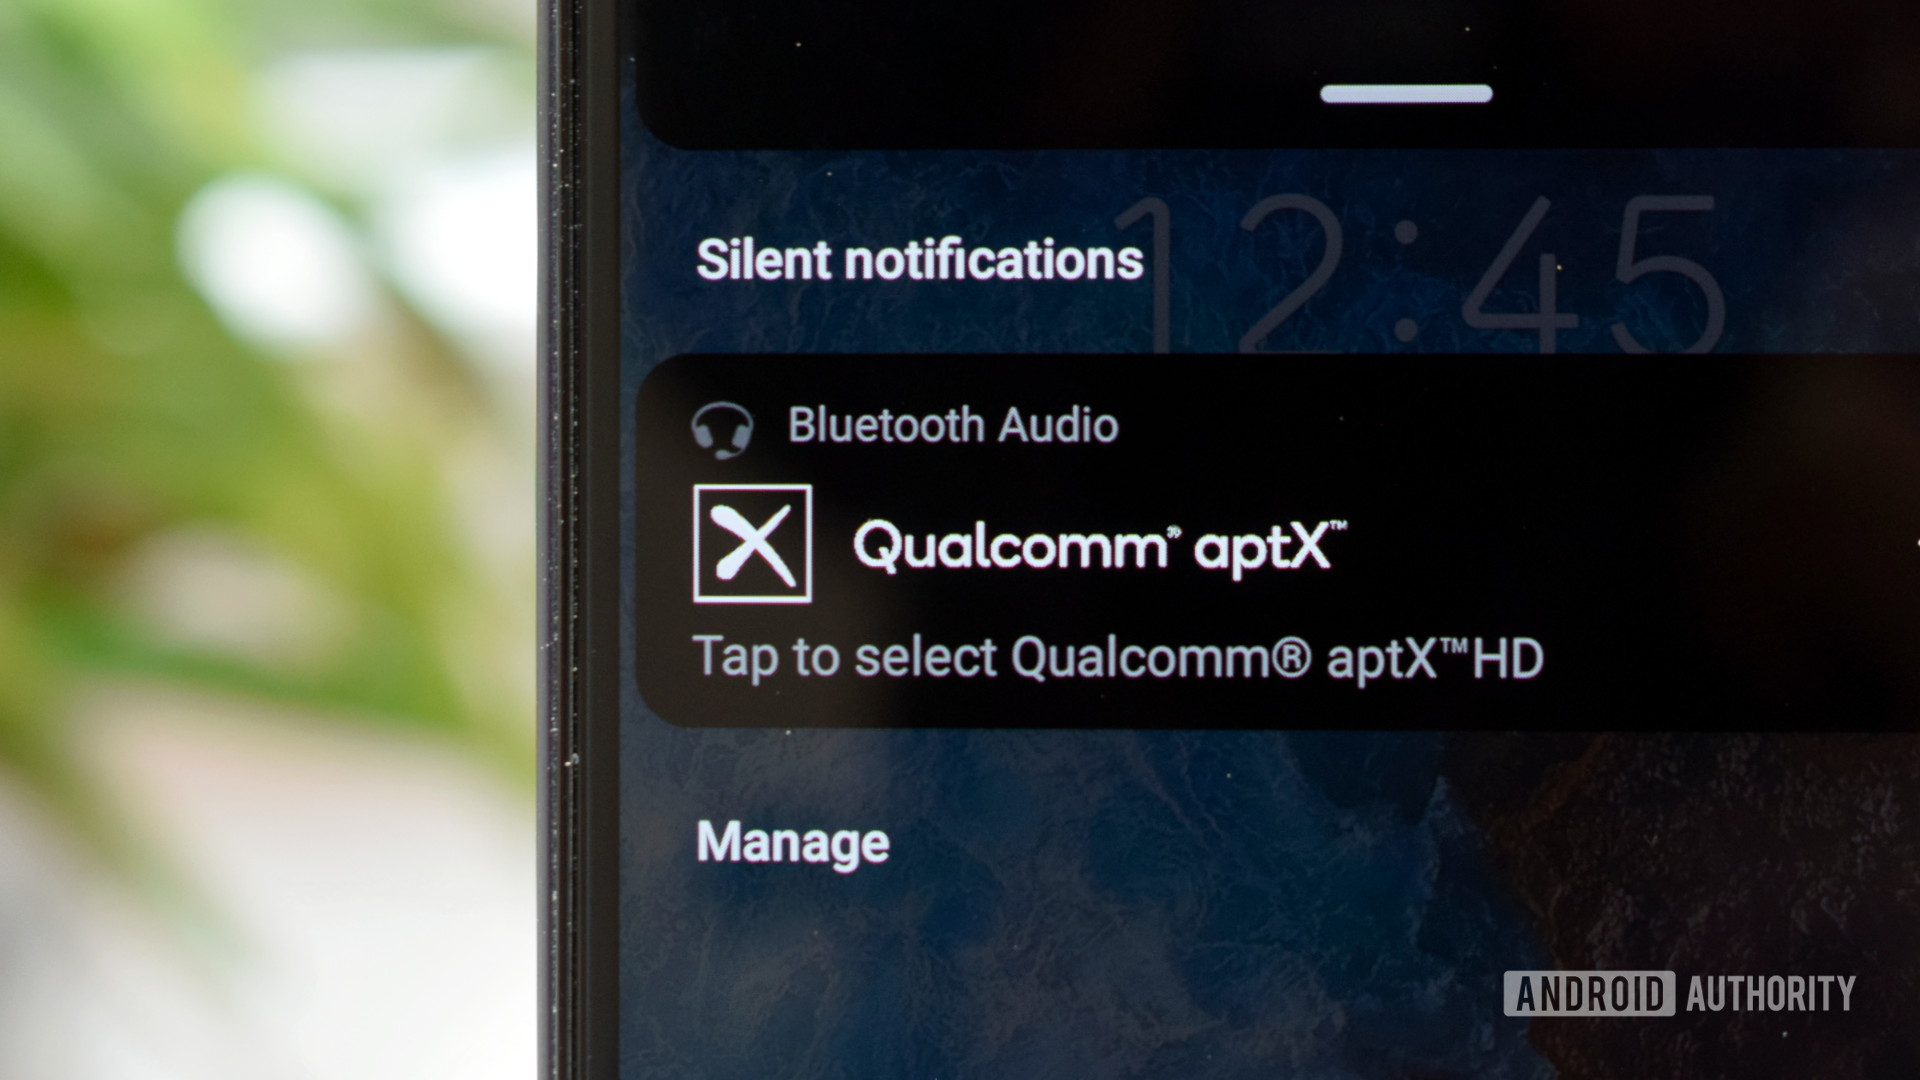 Qualcomm aptX phone notification up close